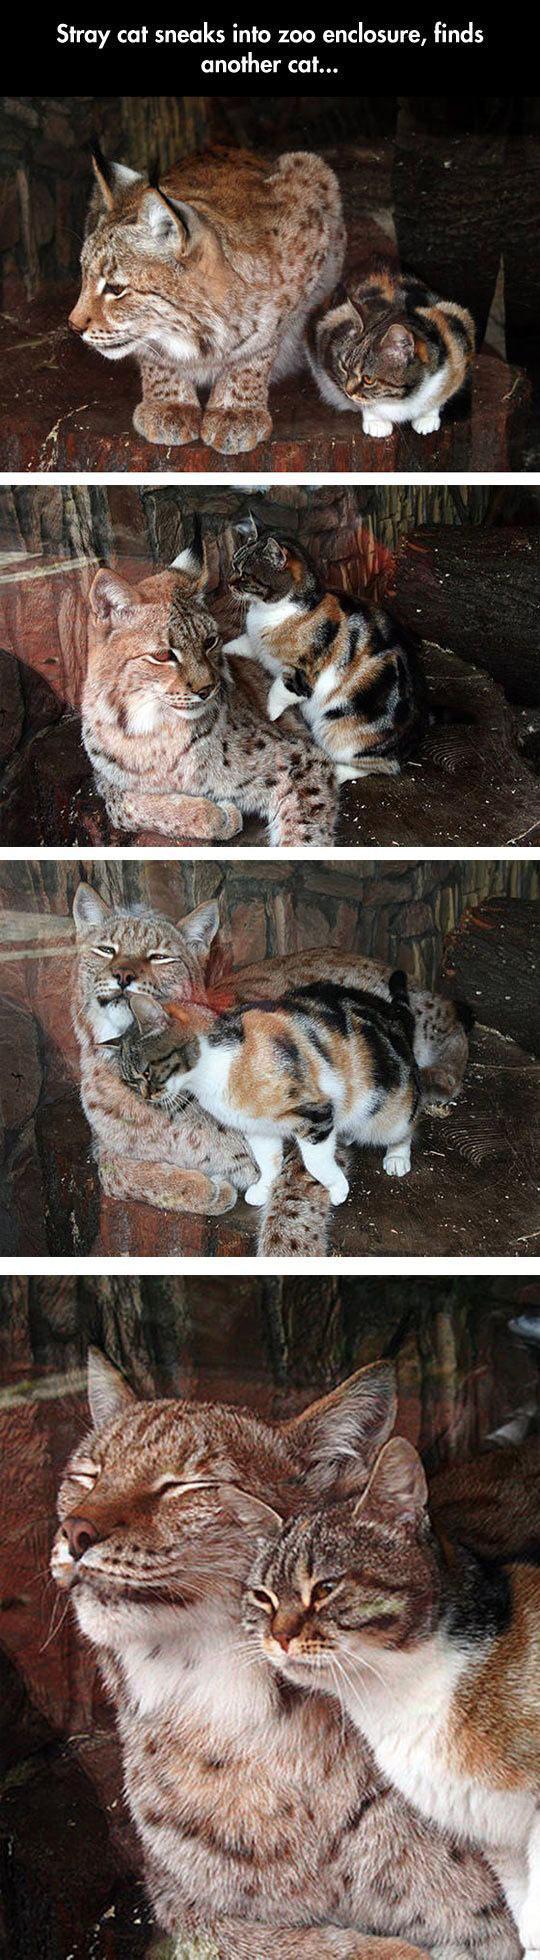 cool-stray-cat-zoo-ocelot